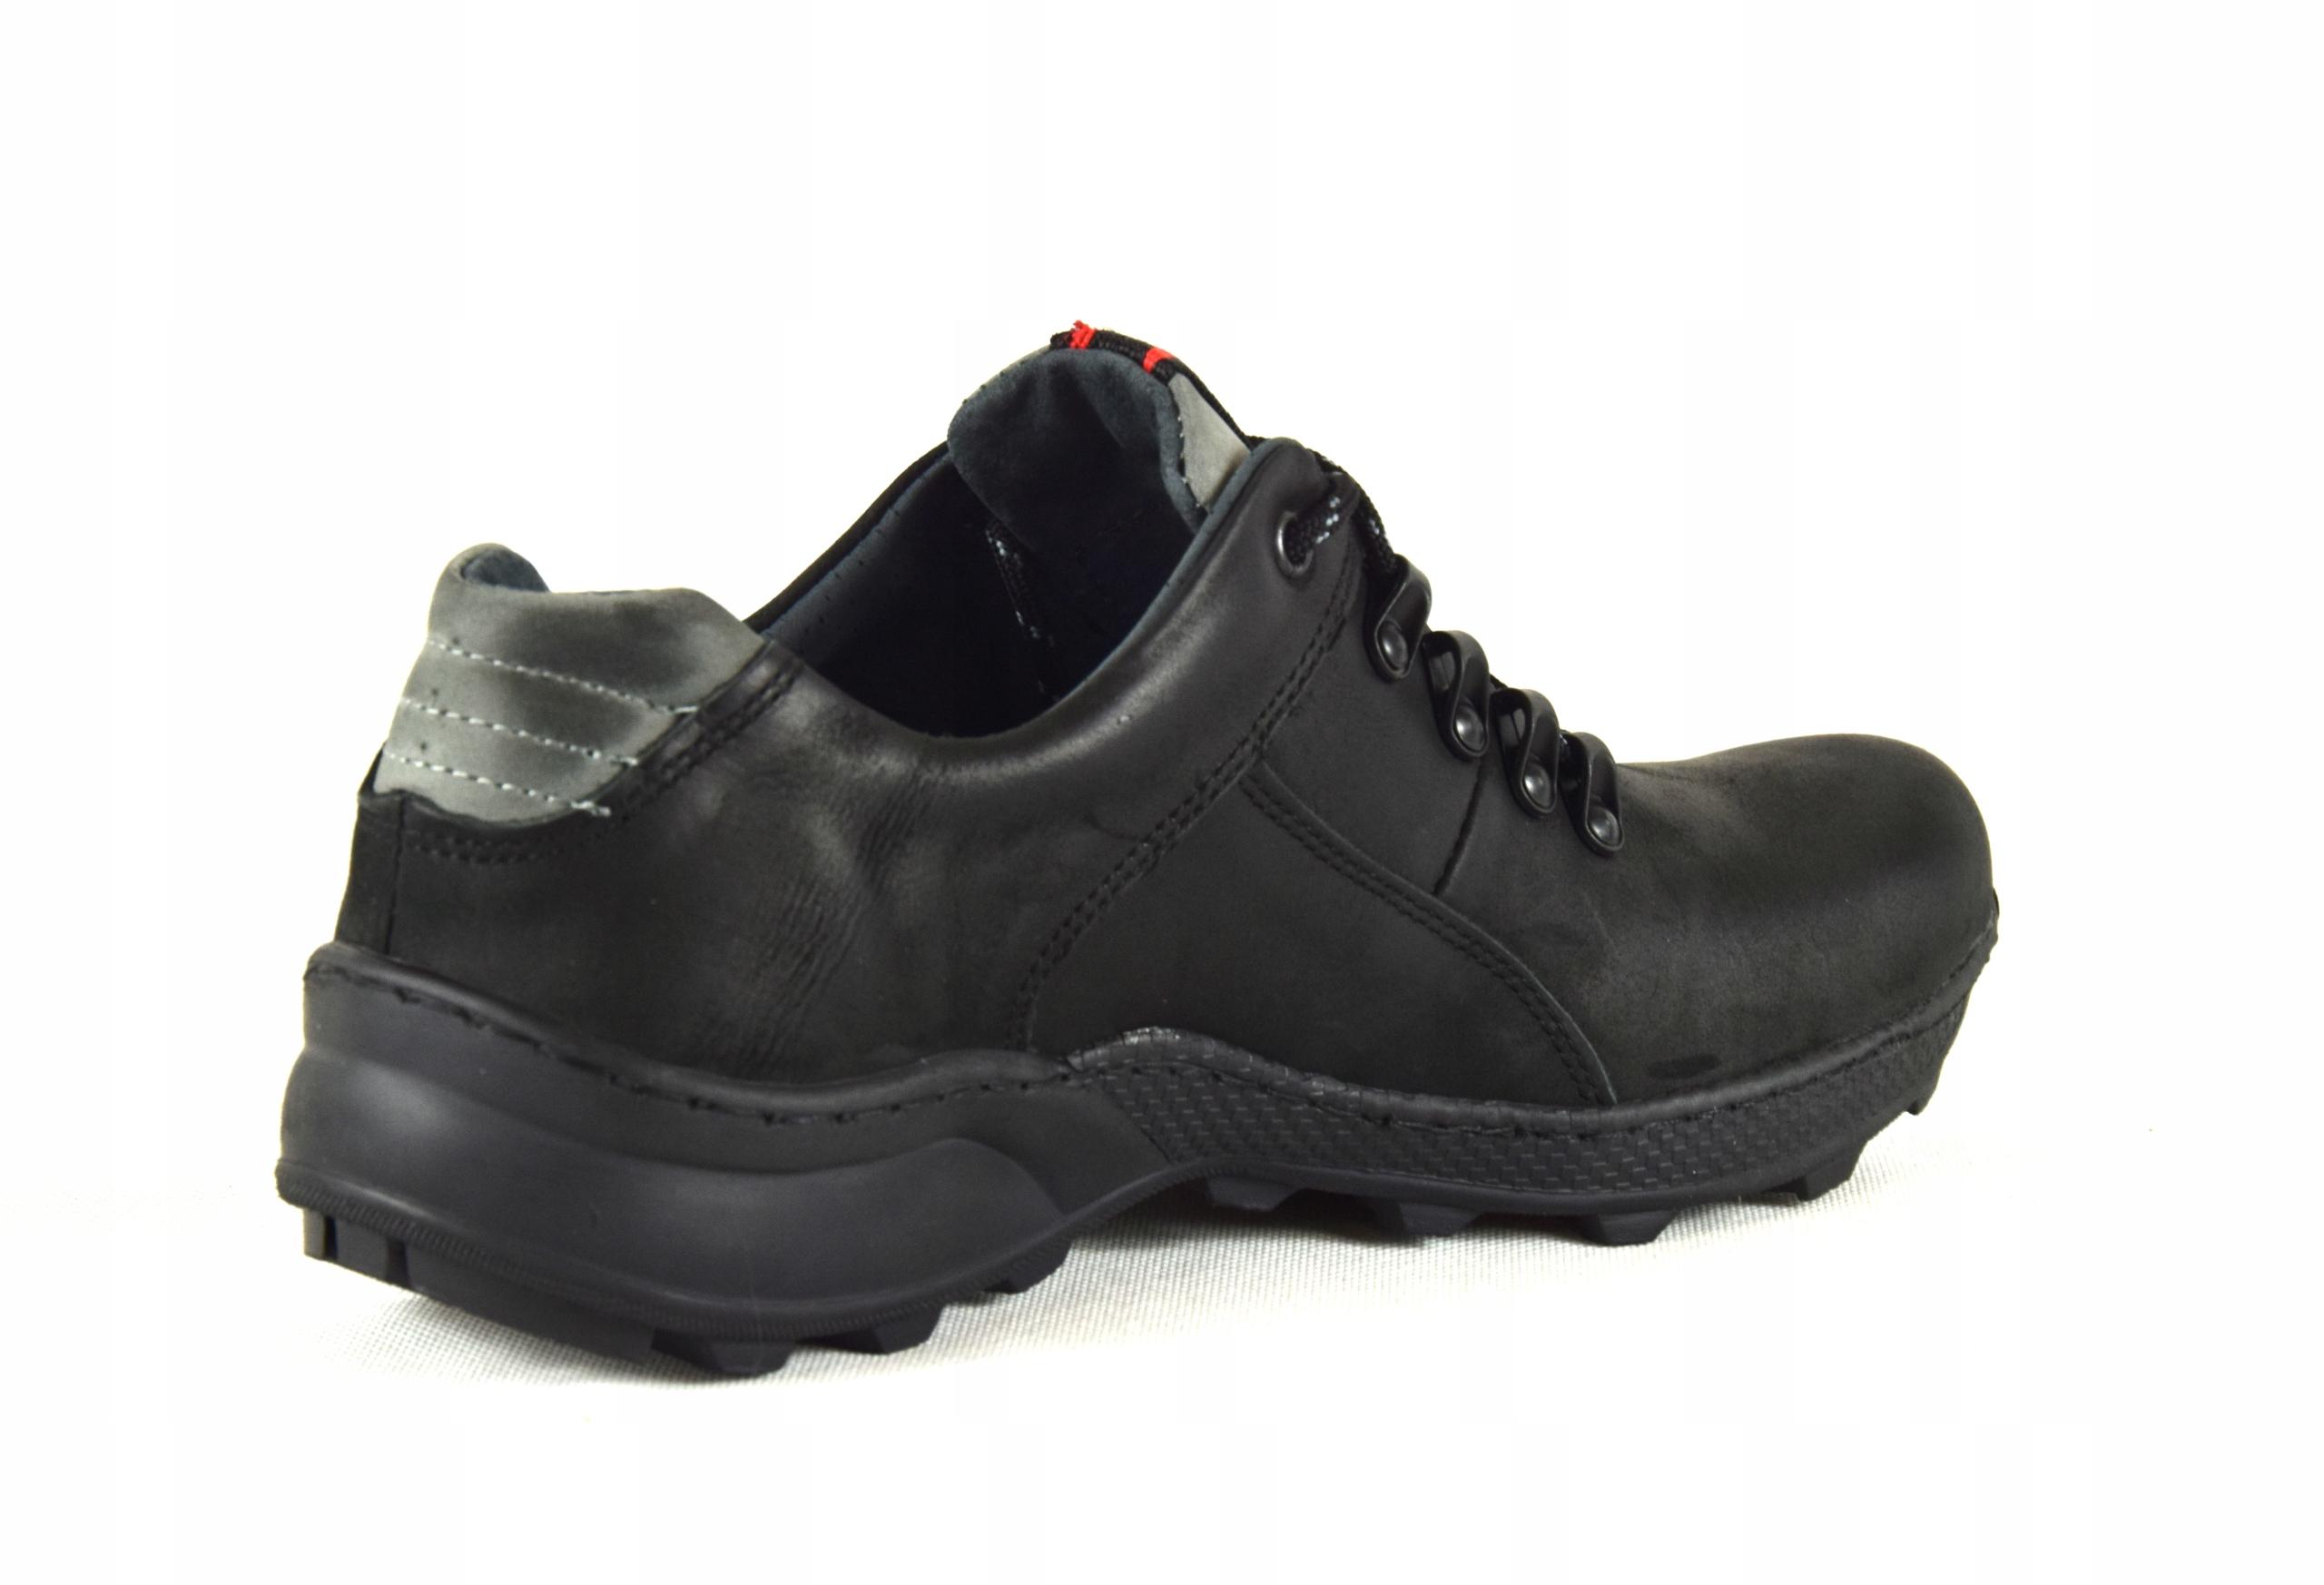 Męskie skórzane obuwie trekkingowe ze skóry 296 Model Trekkingowe